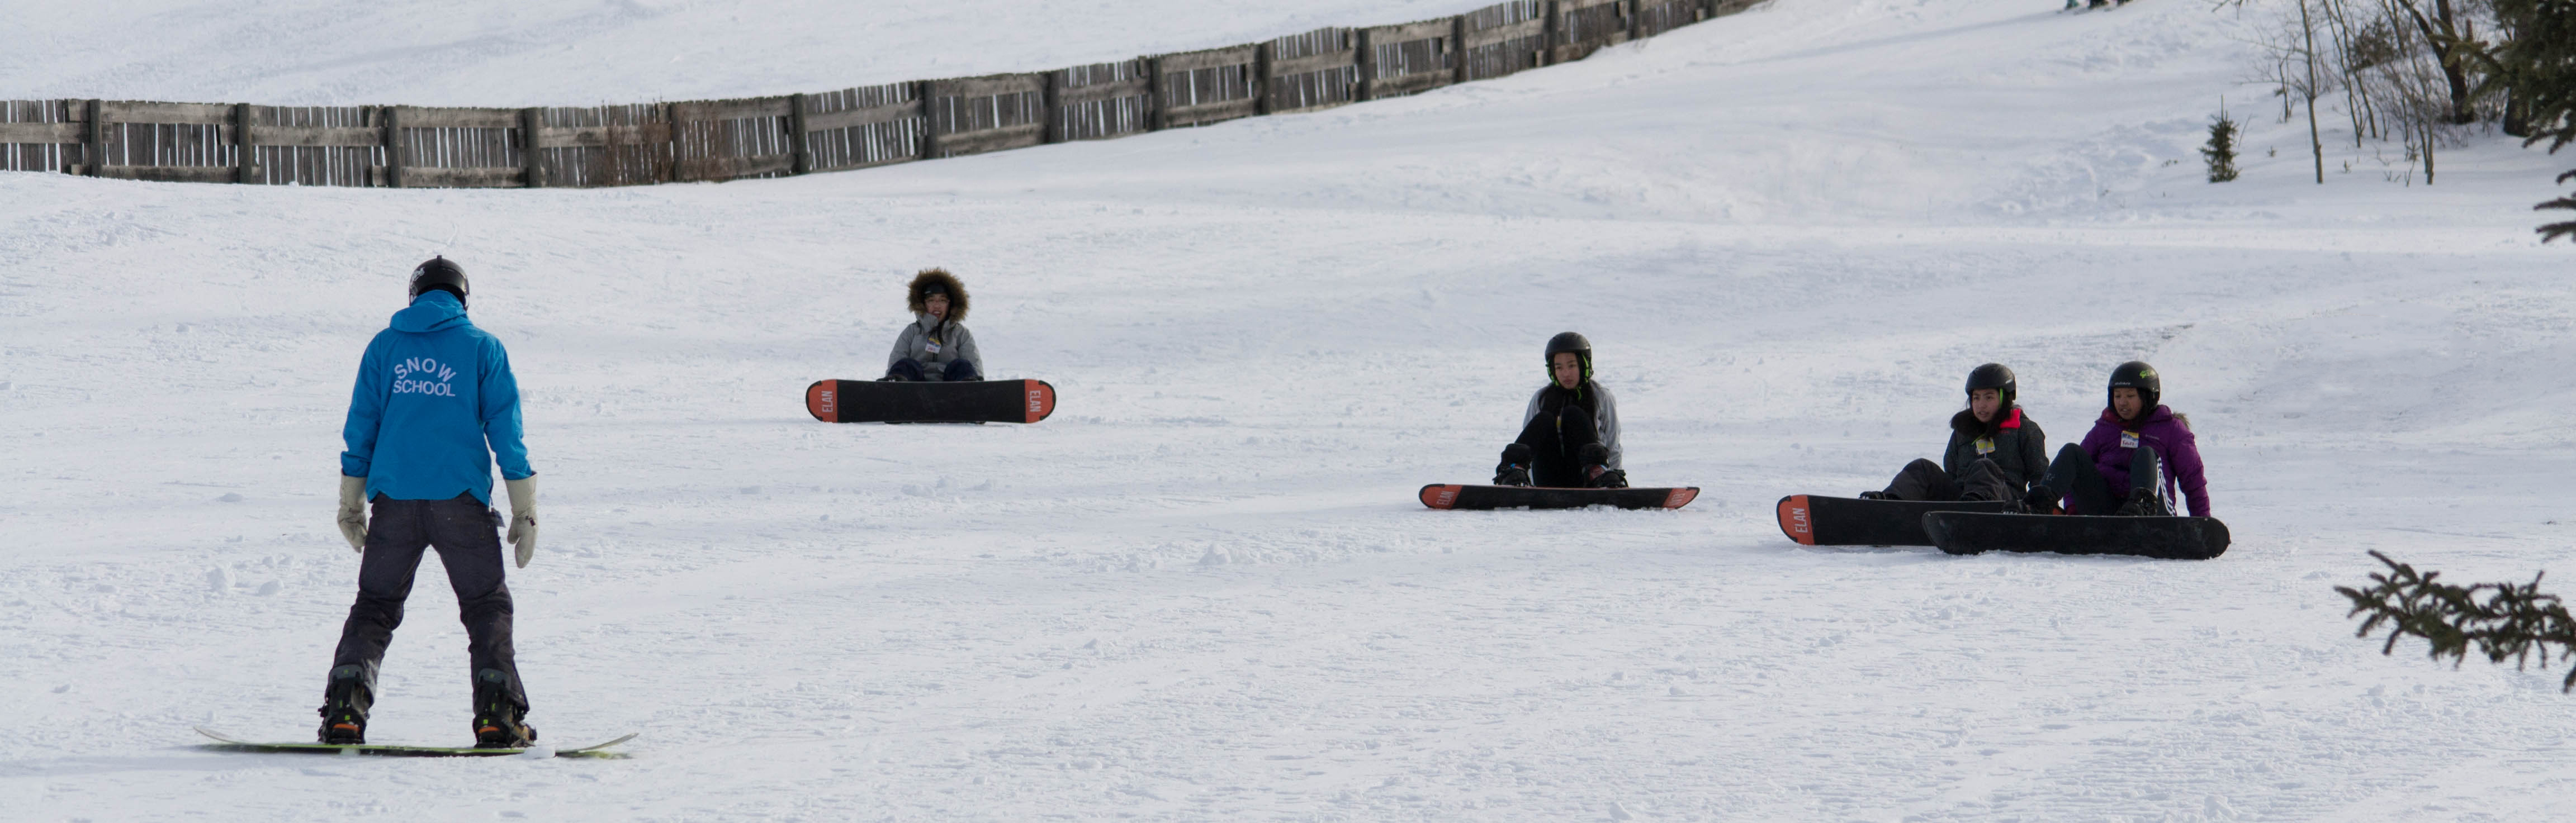 Snow school 7